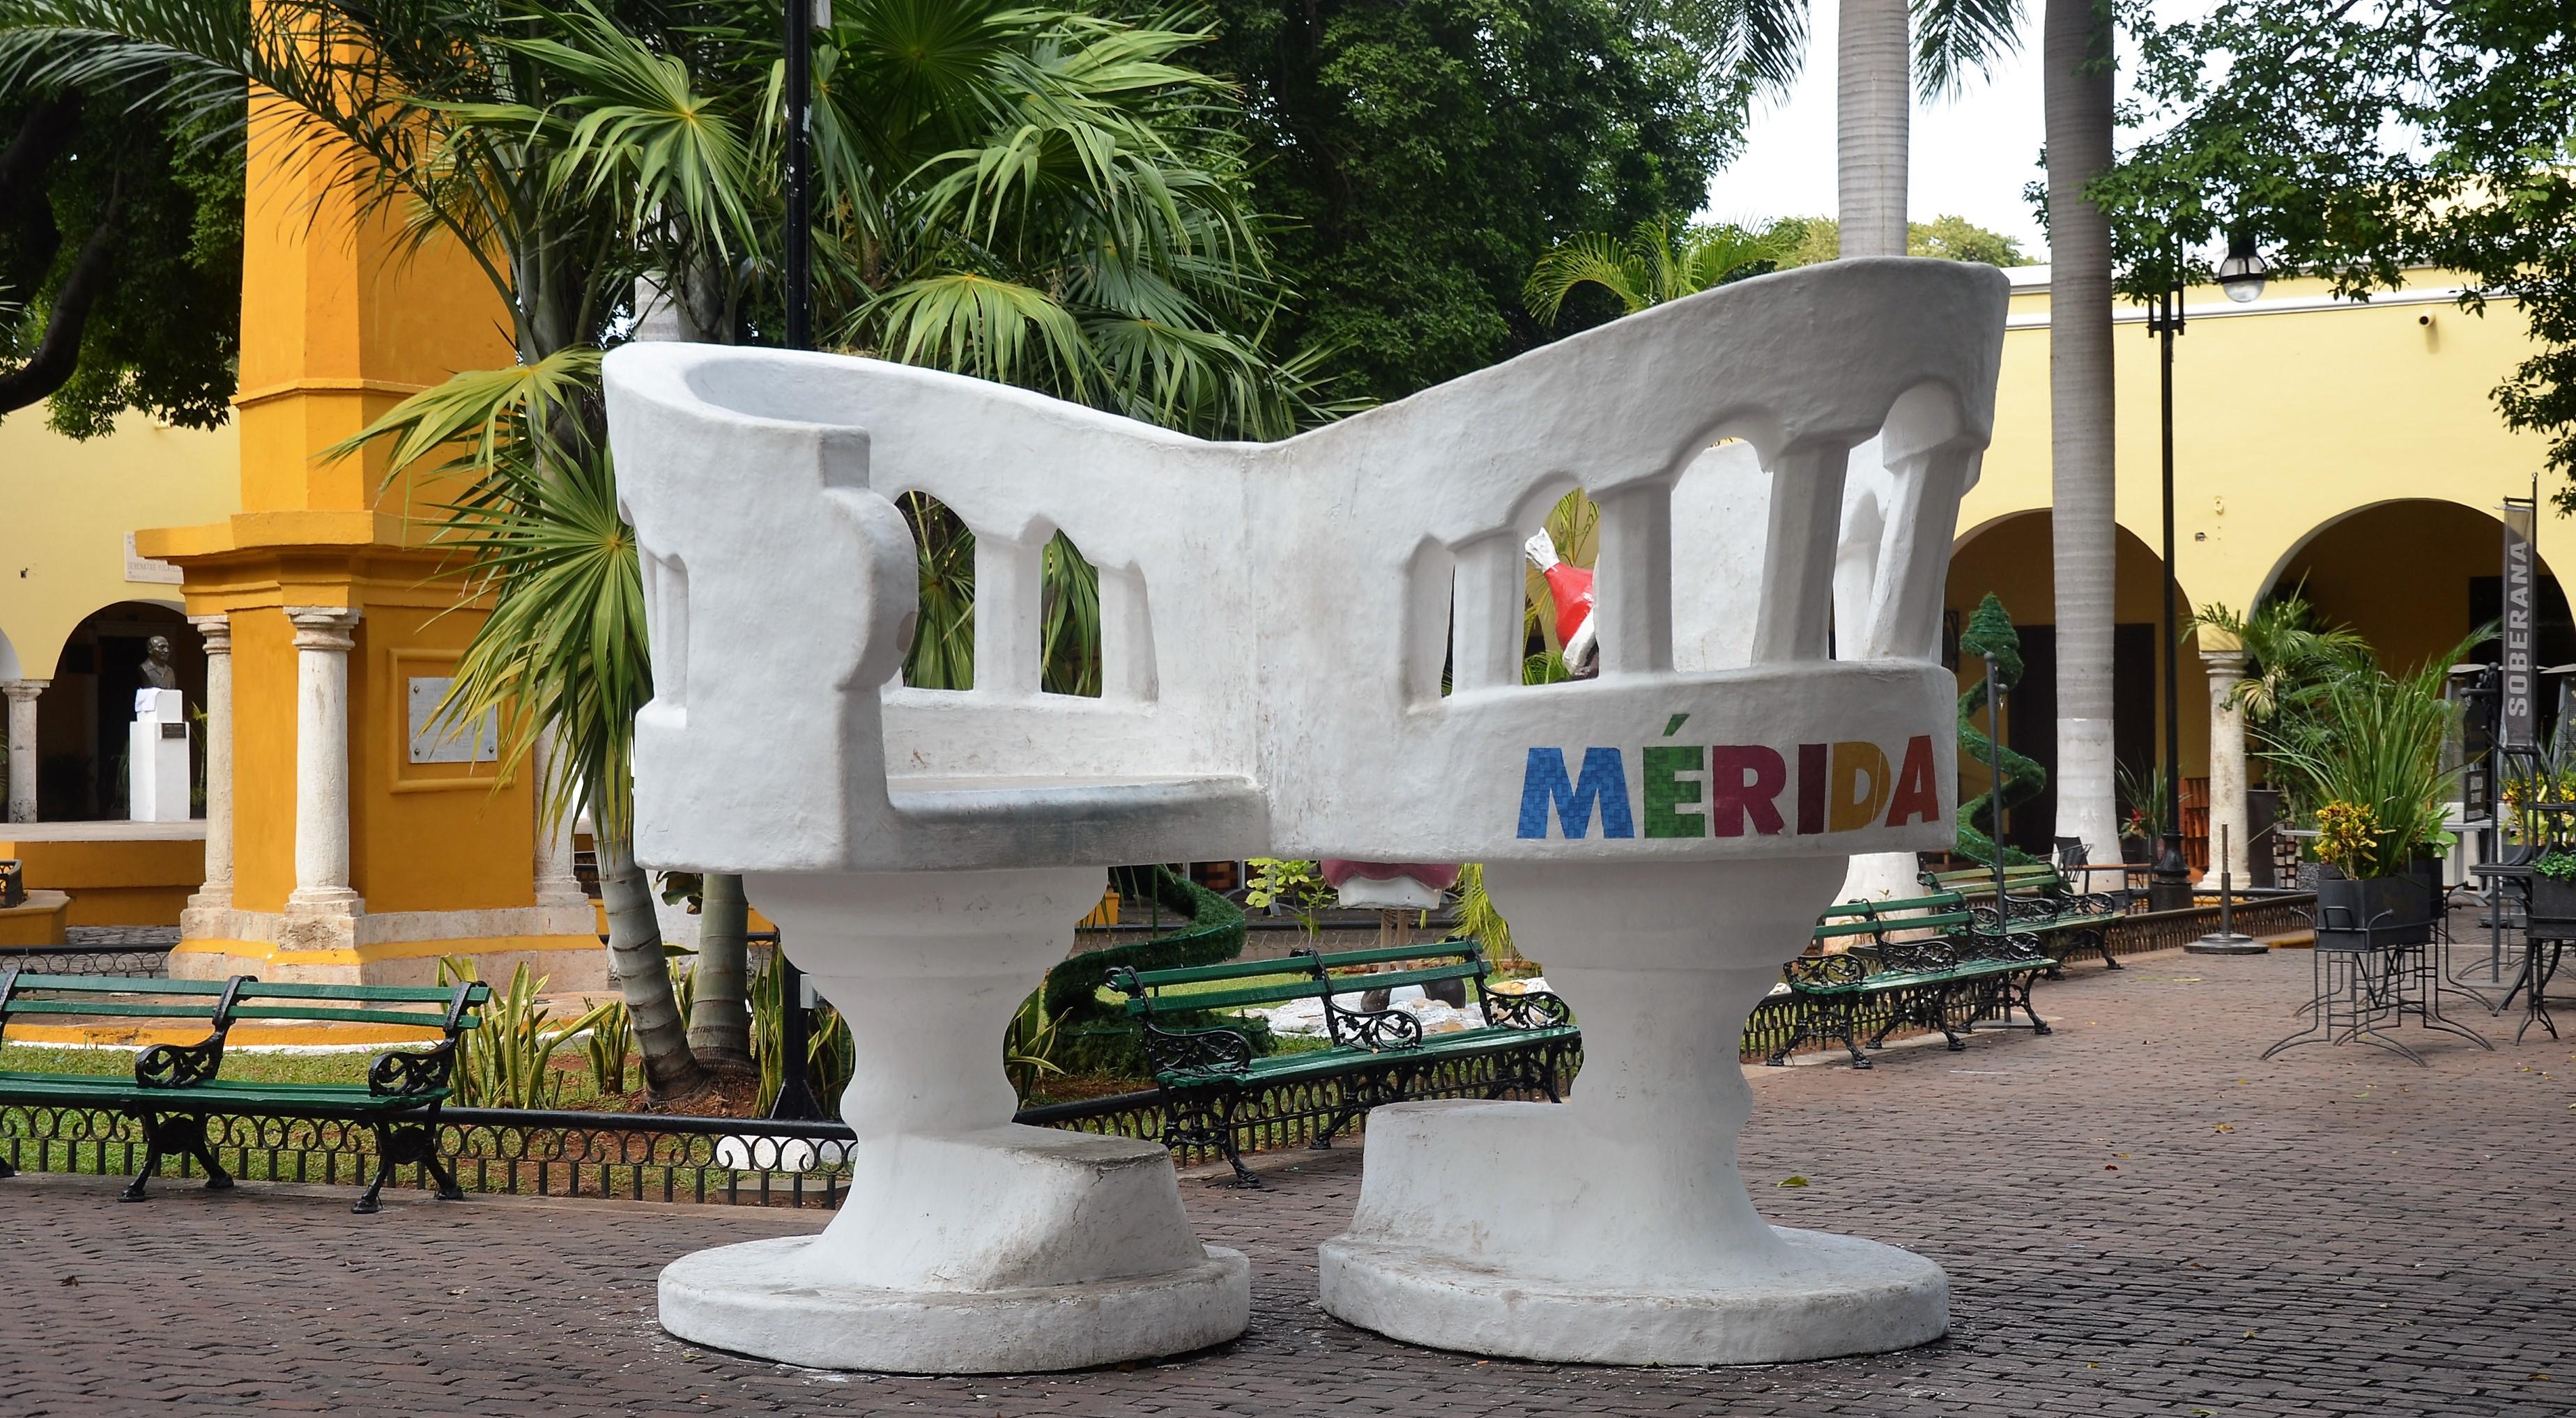 Merida seats